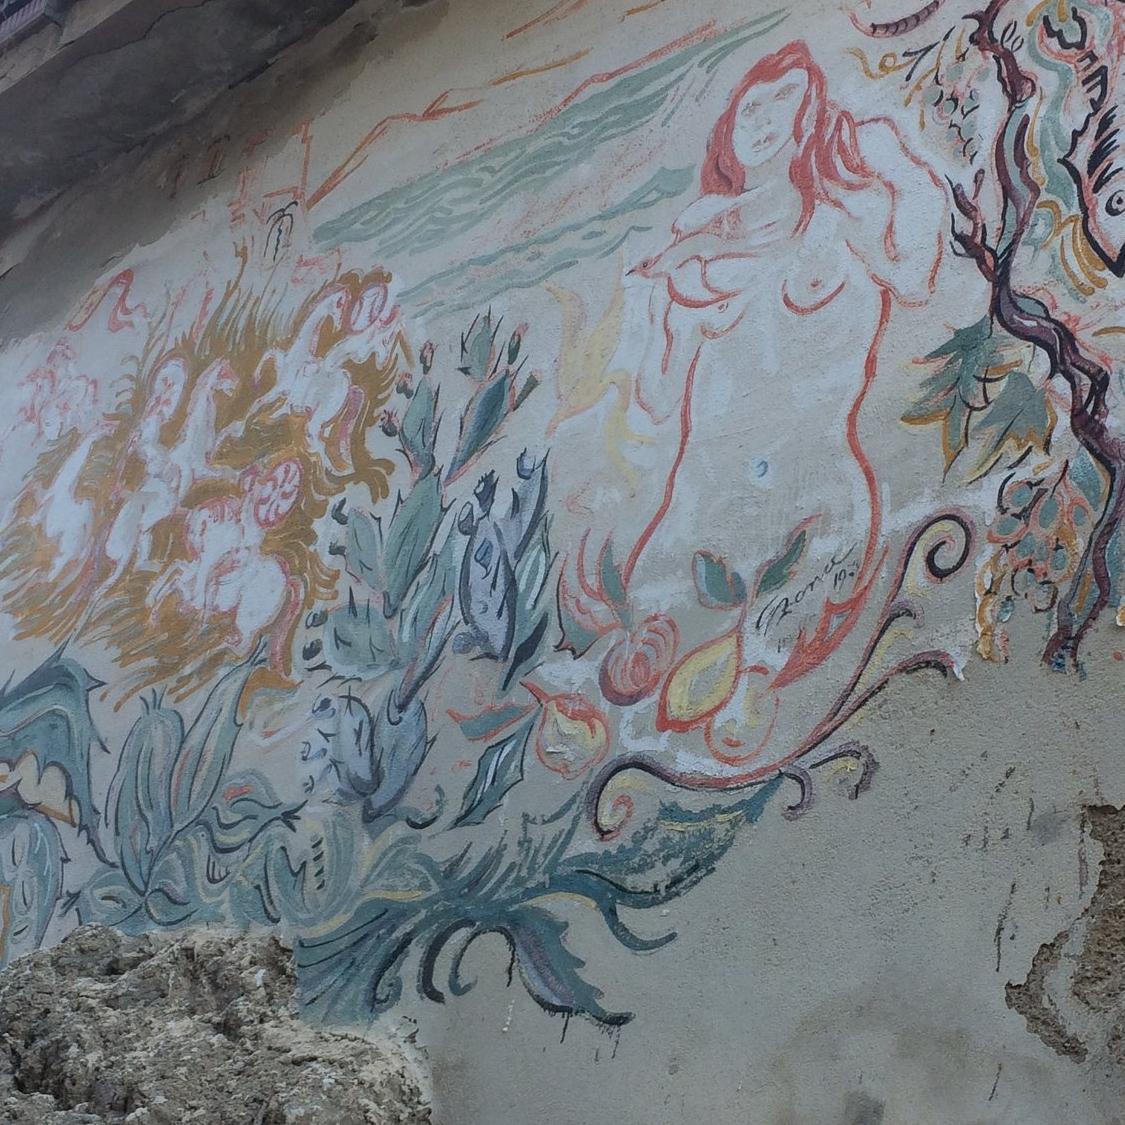 Street art in Scaletta Zanclea